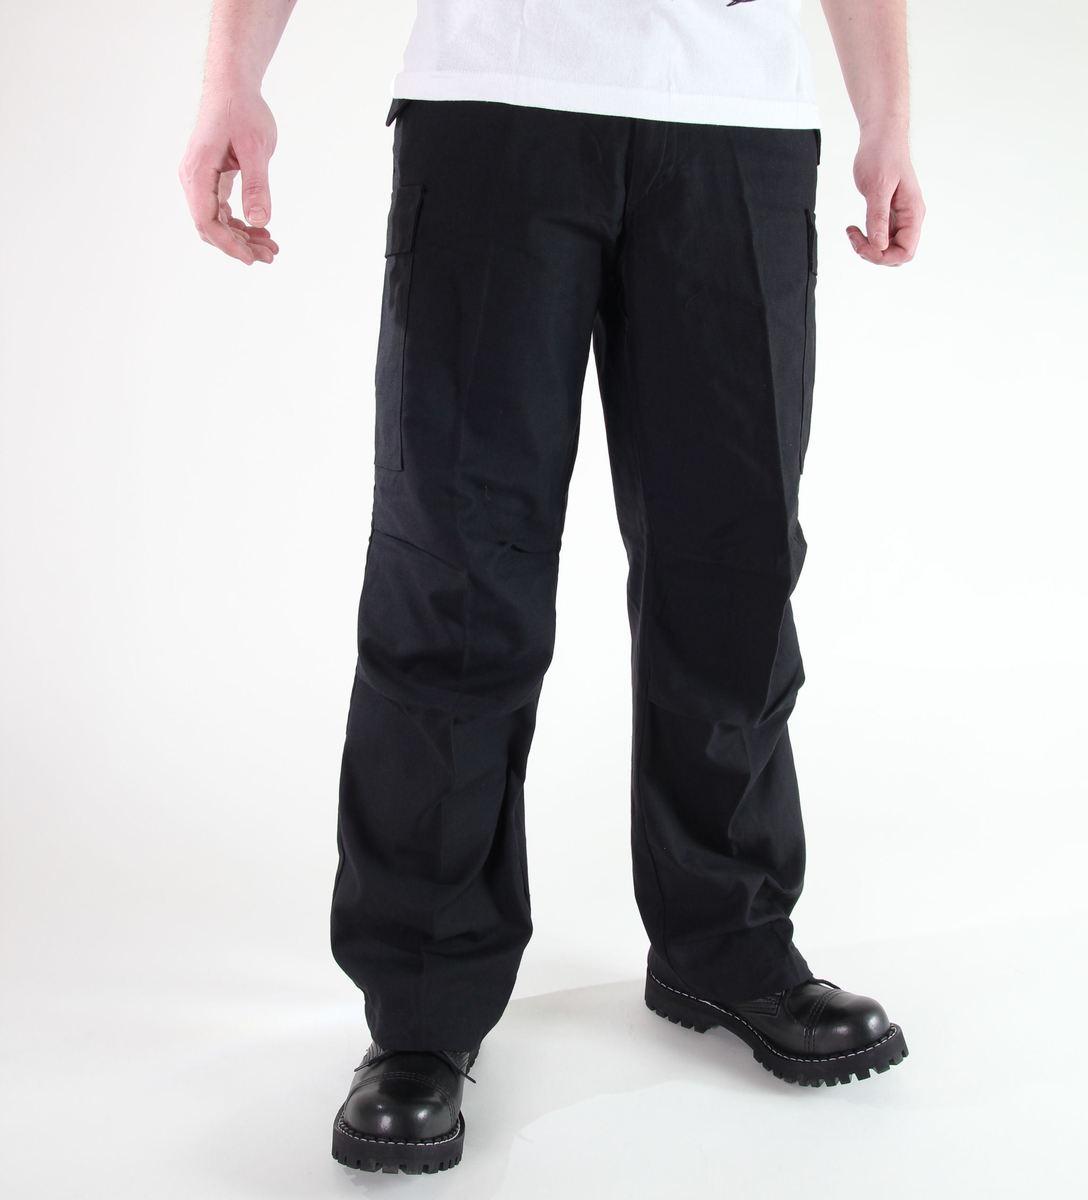 kalhoty pánské MIL-TEC - US Feldhose - M65 - Nyco Black - 11501002